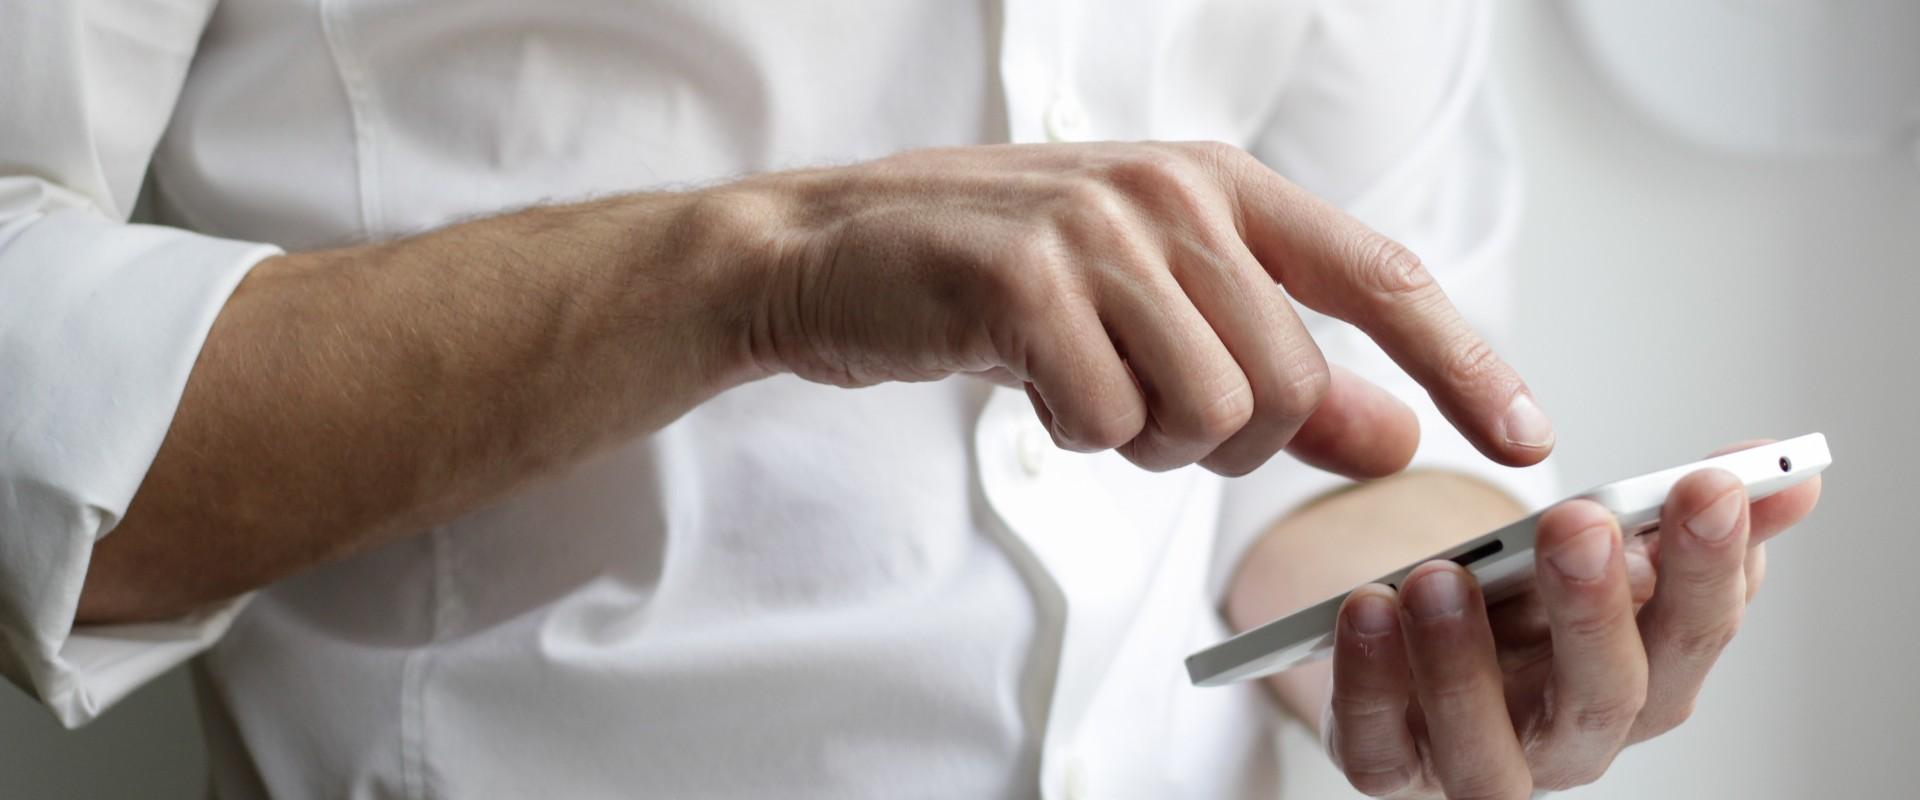 Identiteitsfraude, Oplichting en Kredietverzekering